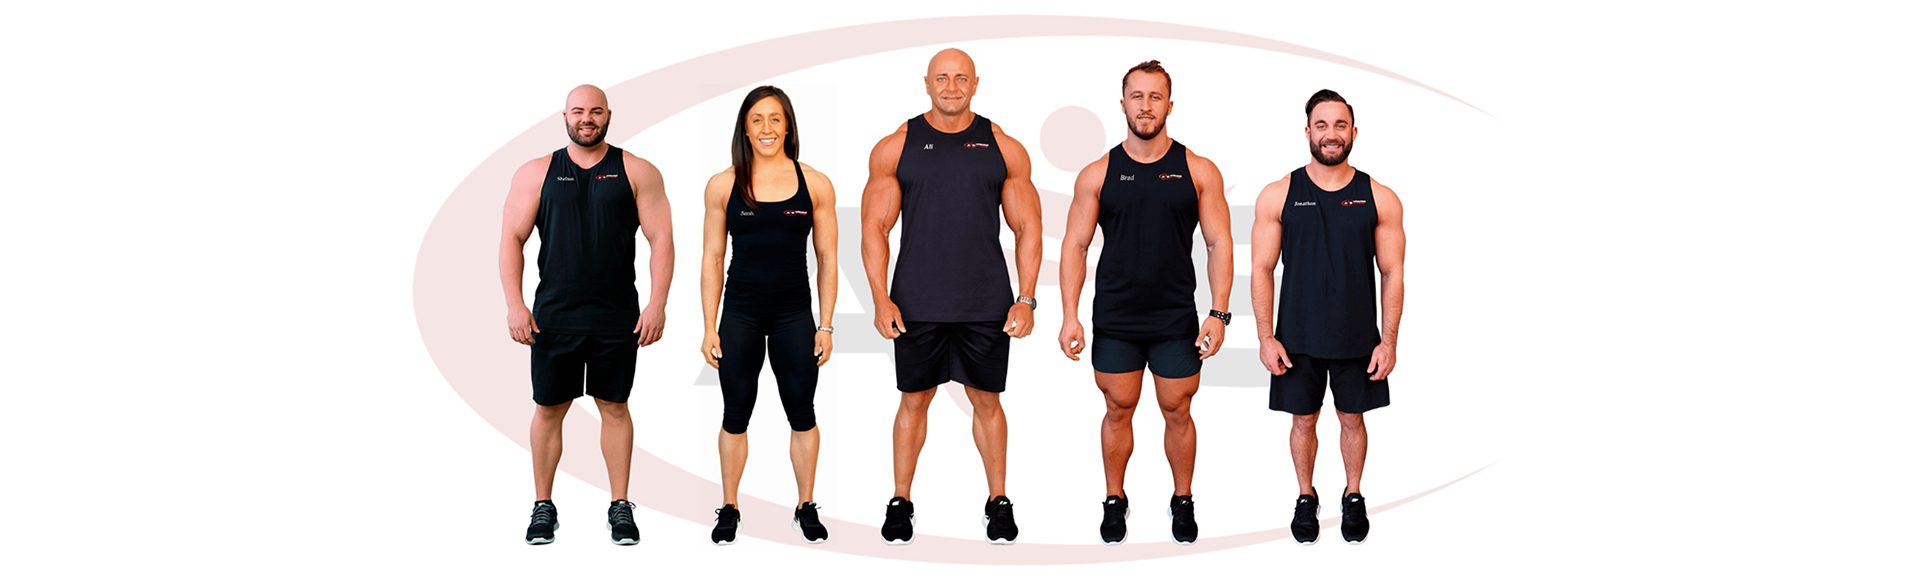 Top personal trainers Dallas